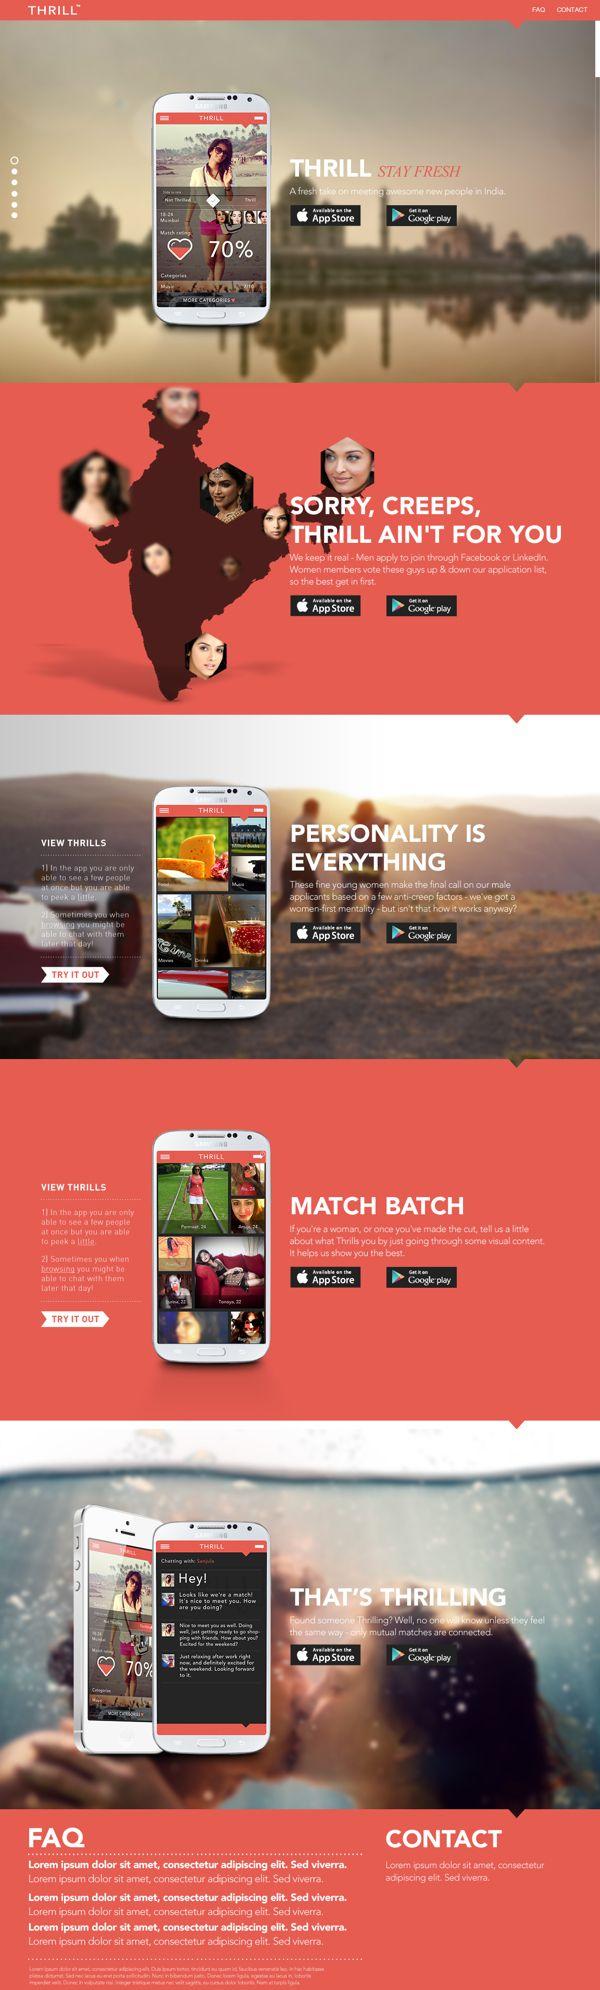 Once dating app website